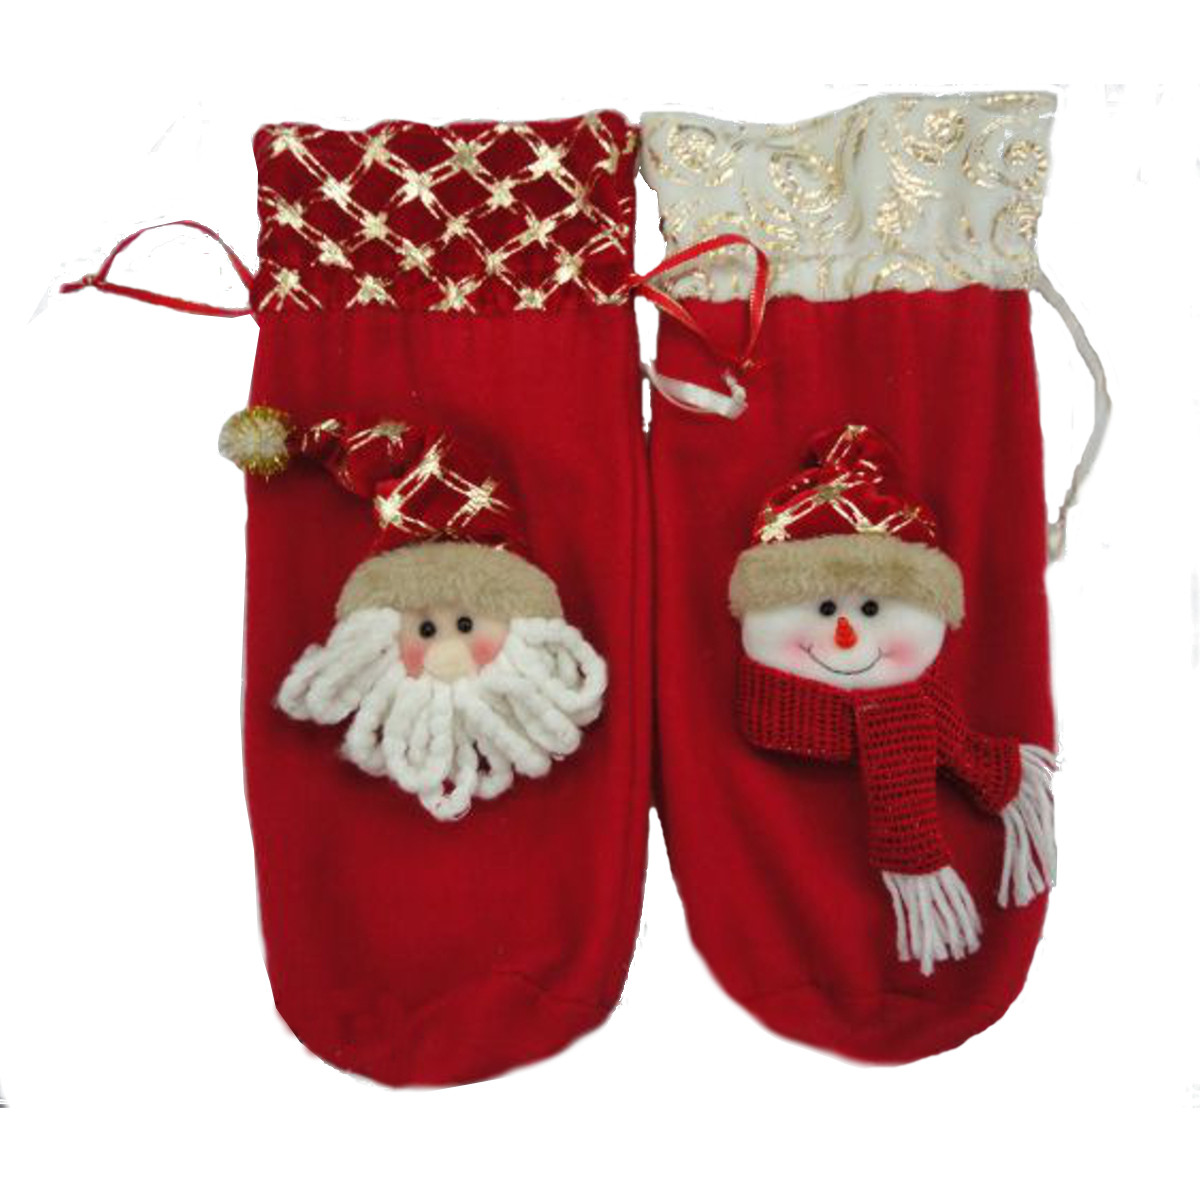 Natal de 36 cm xmas o boneco de neve de bolsa de cobertura de garrafa de vinho santa clau